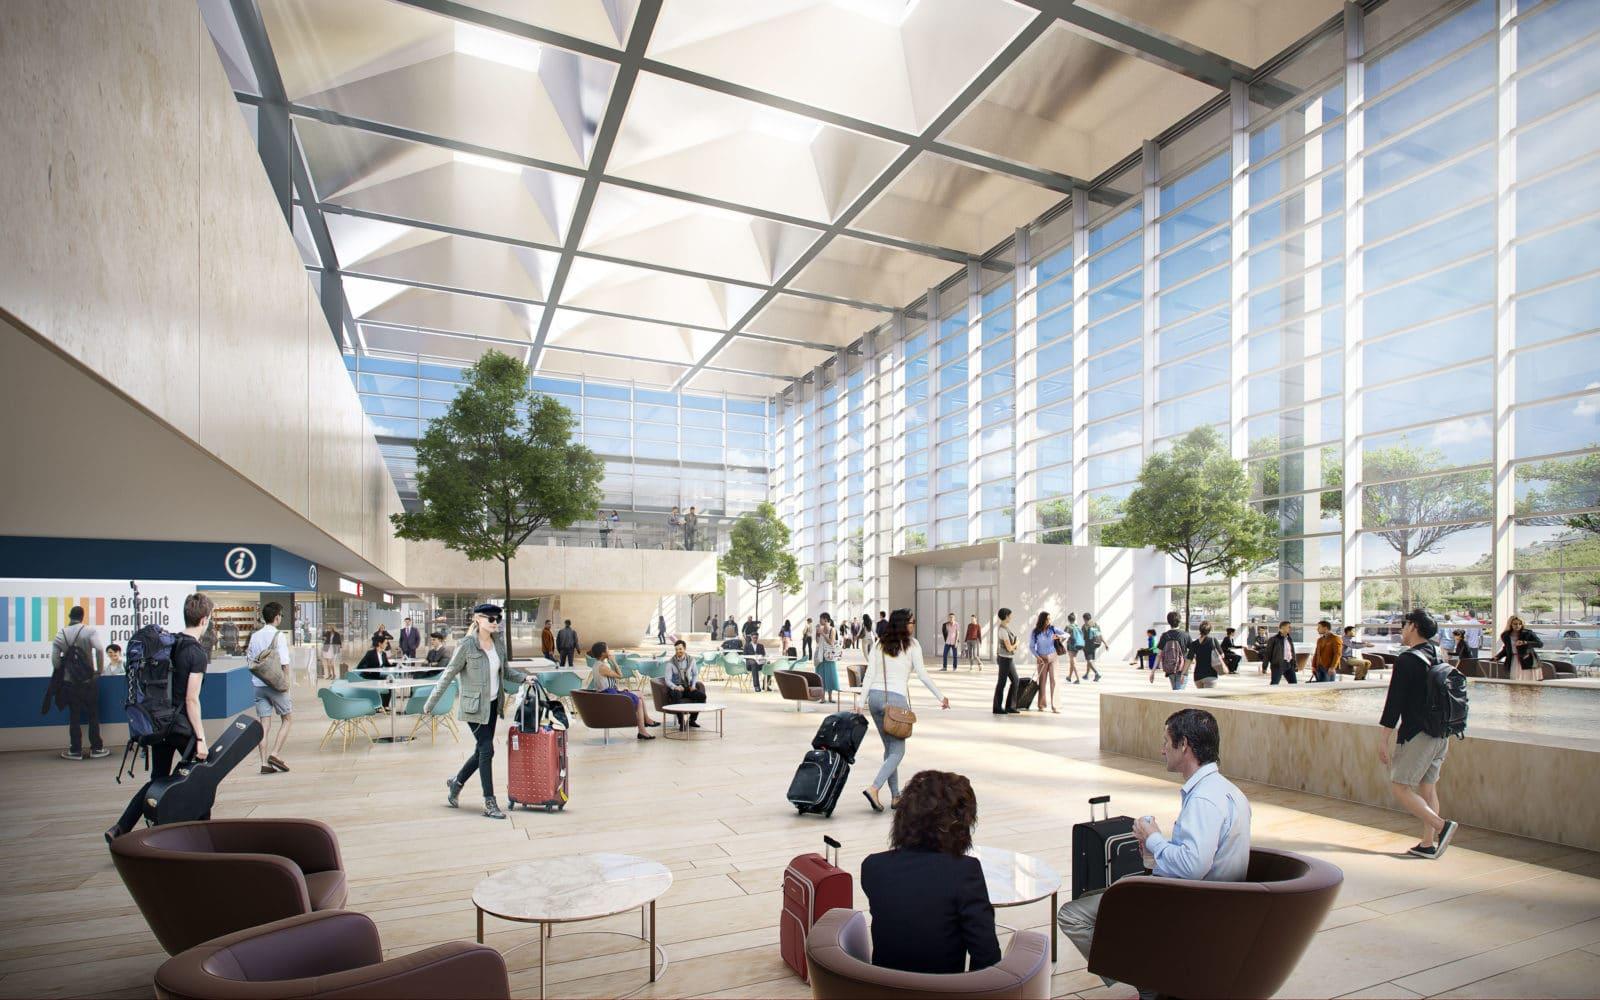 aeroport marseille extension foster 3